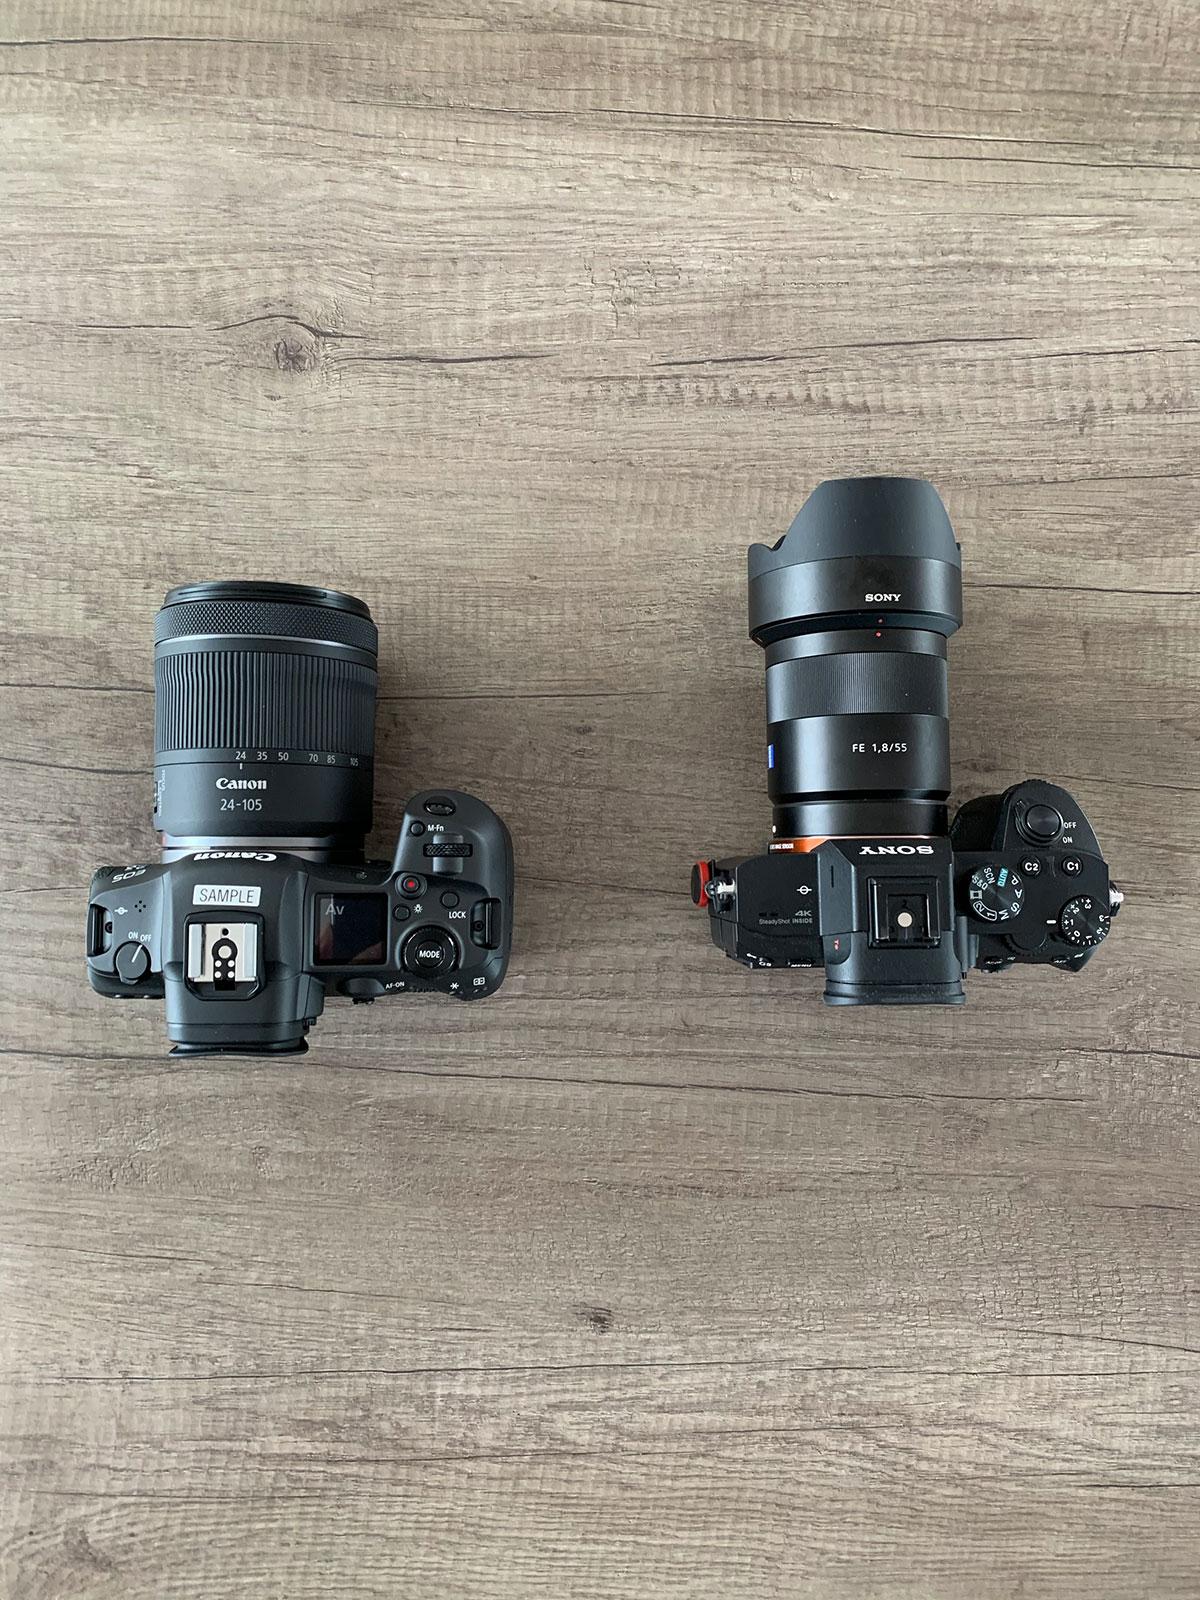 Le Canon EOS R5 comparé à un A7 III